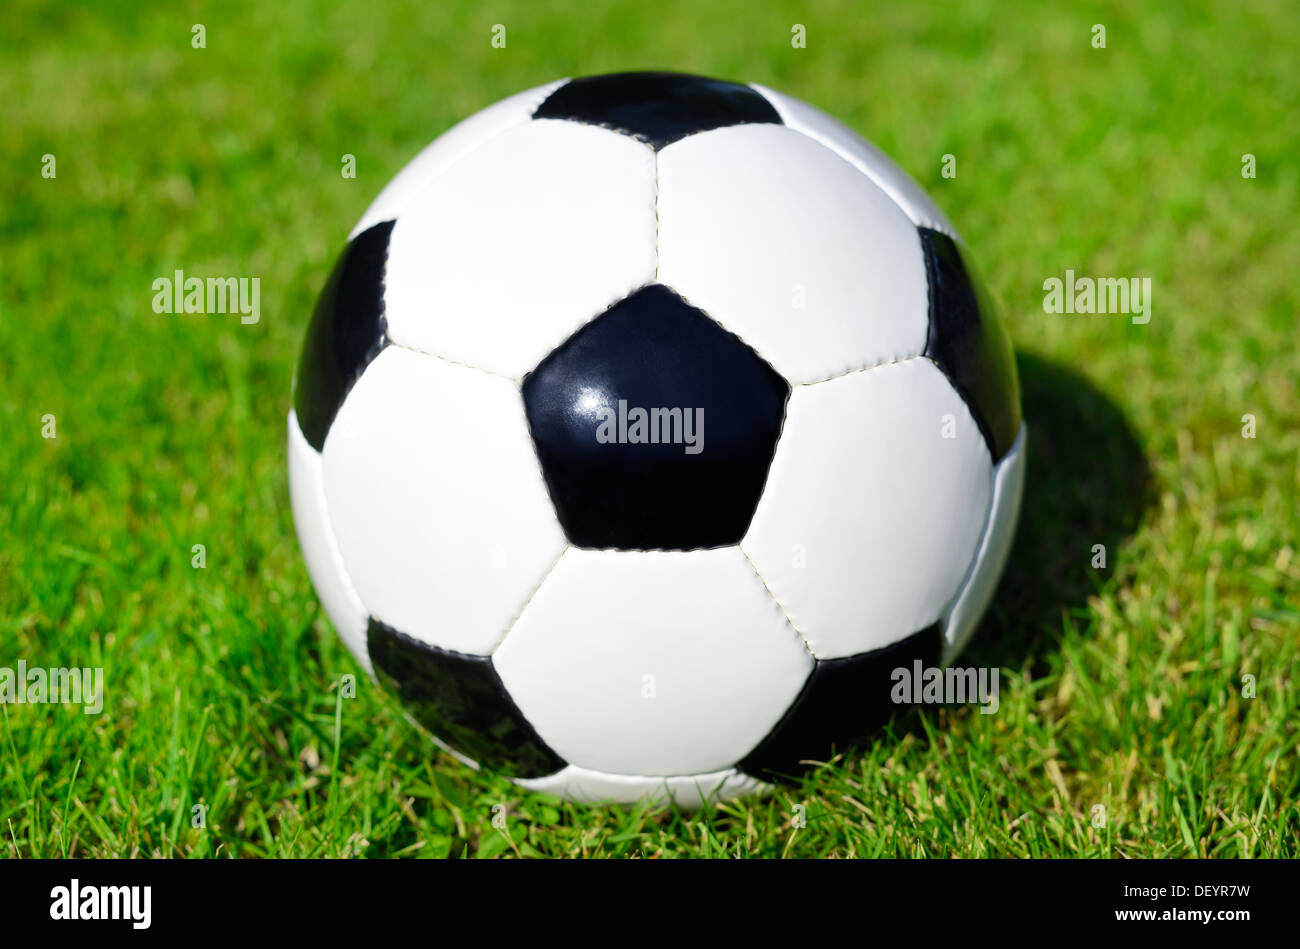 Black-and-white football, Schwarz-weißer Fußball - Stock Image